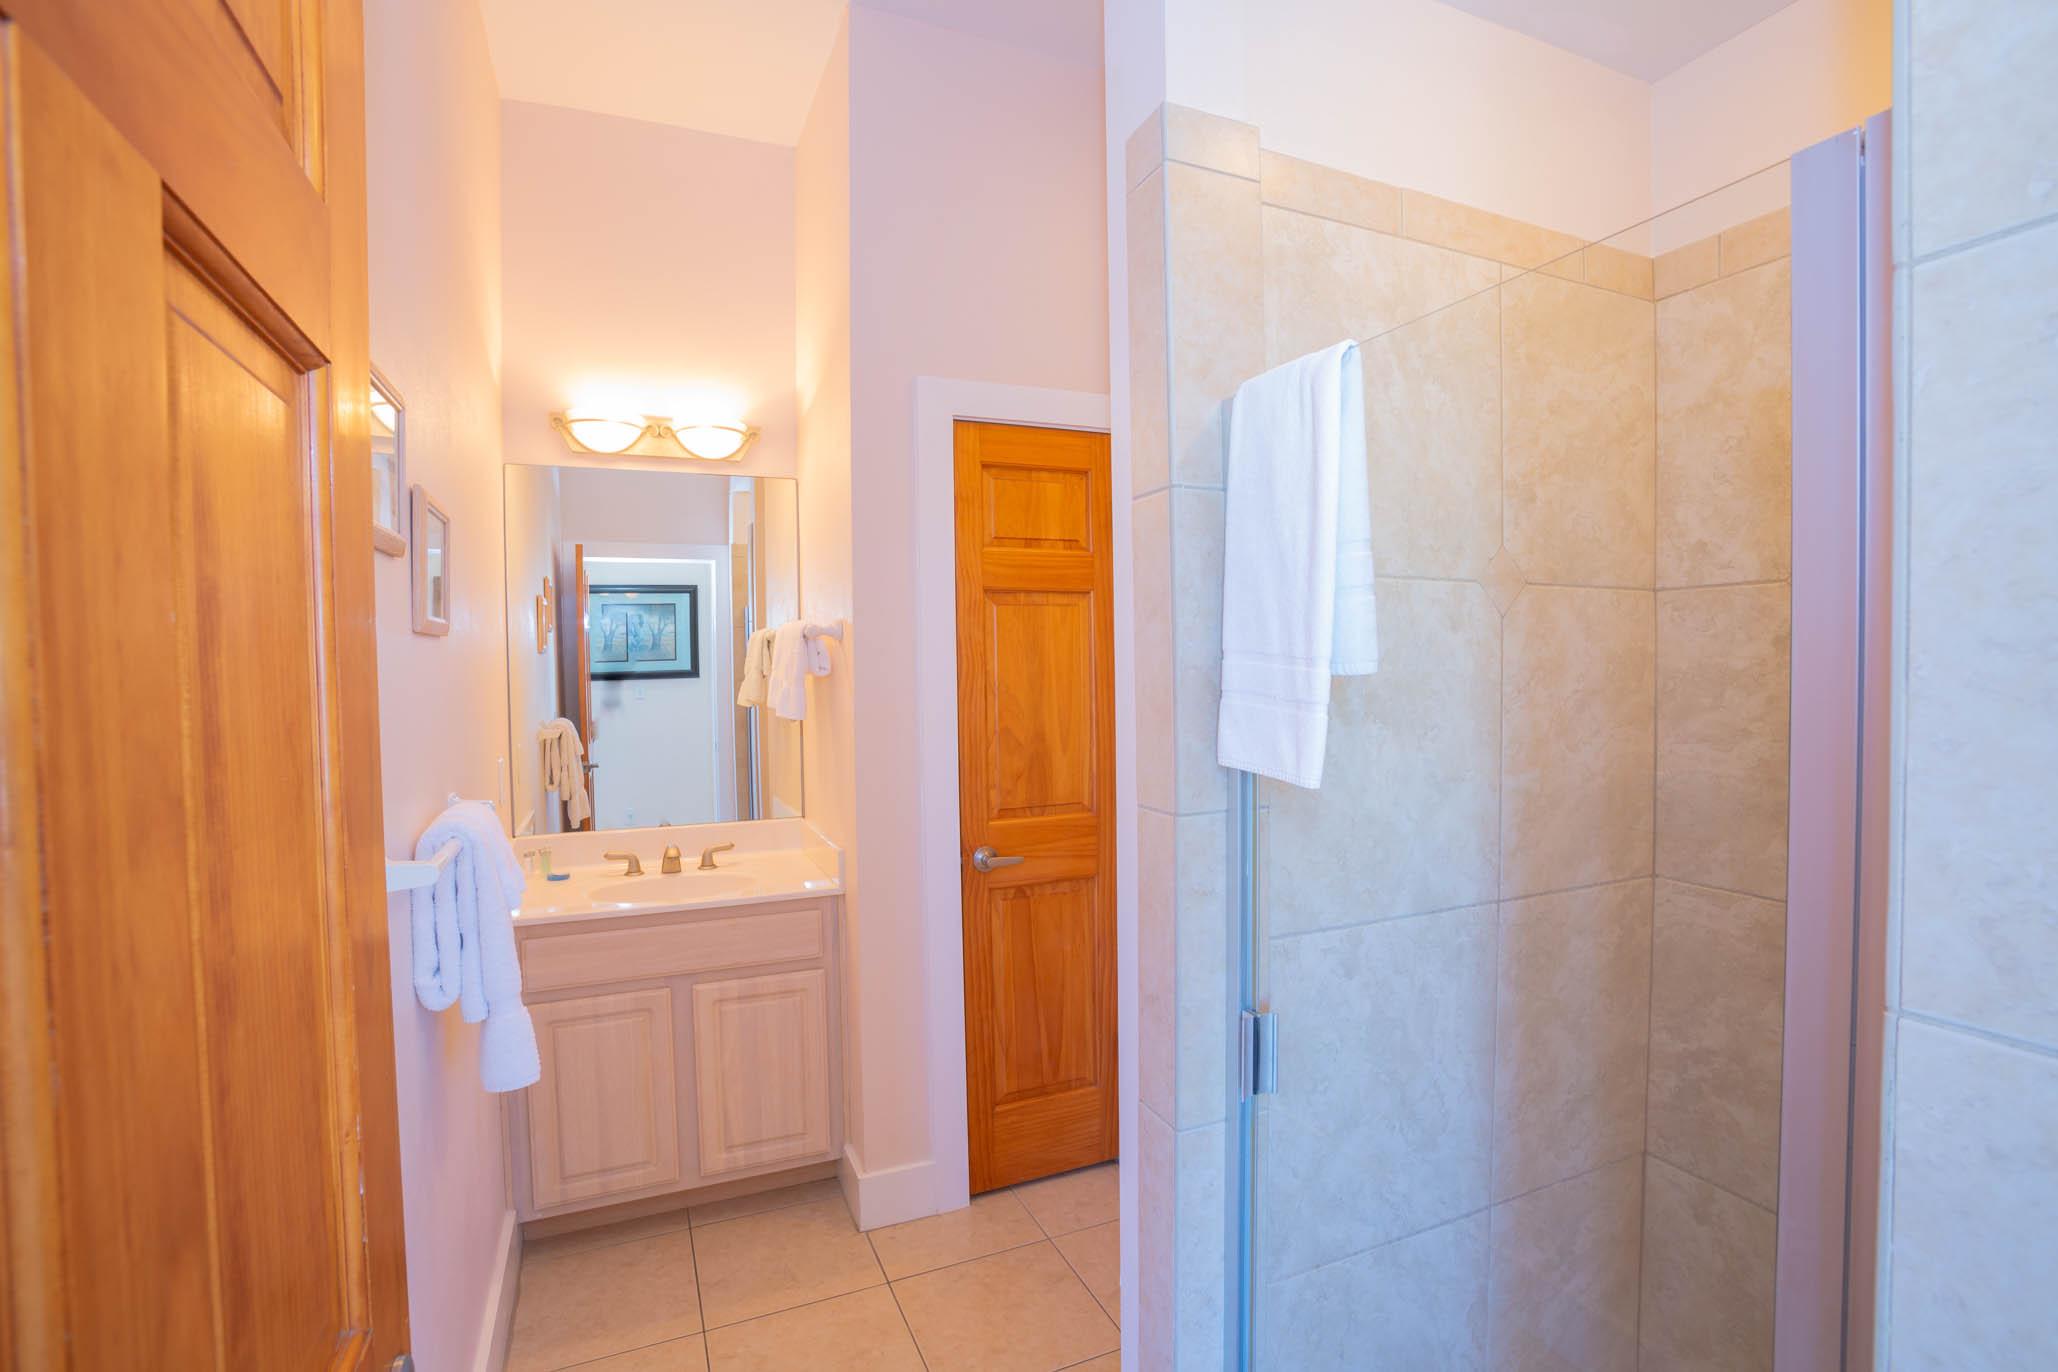 Ariola 1214 House/Cottage rental in Luxury Homes in Pensacola Beach Florida - #41